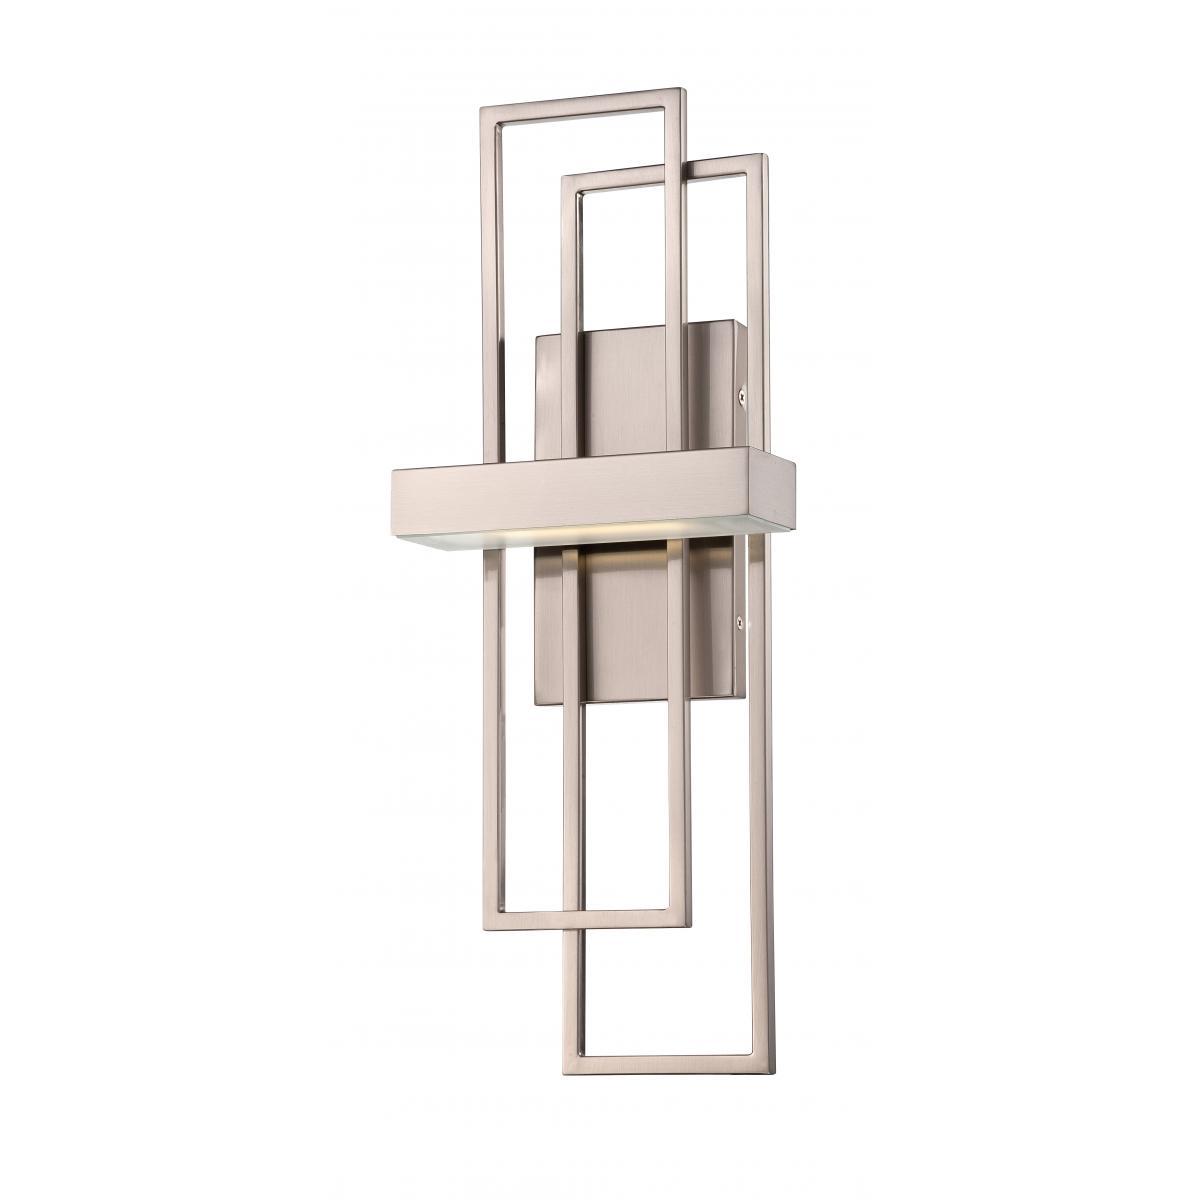 62-105 FRAME LED WALL SCONCE